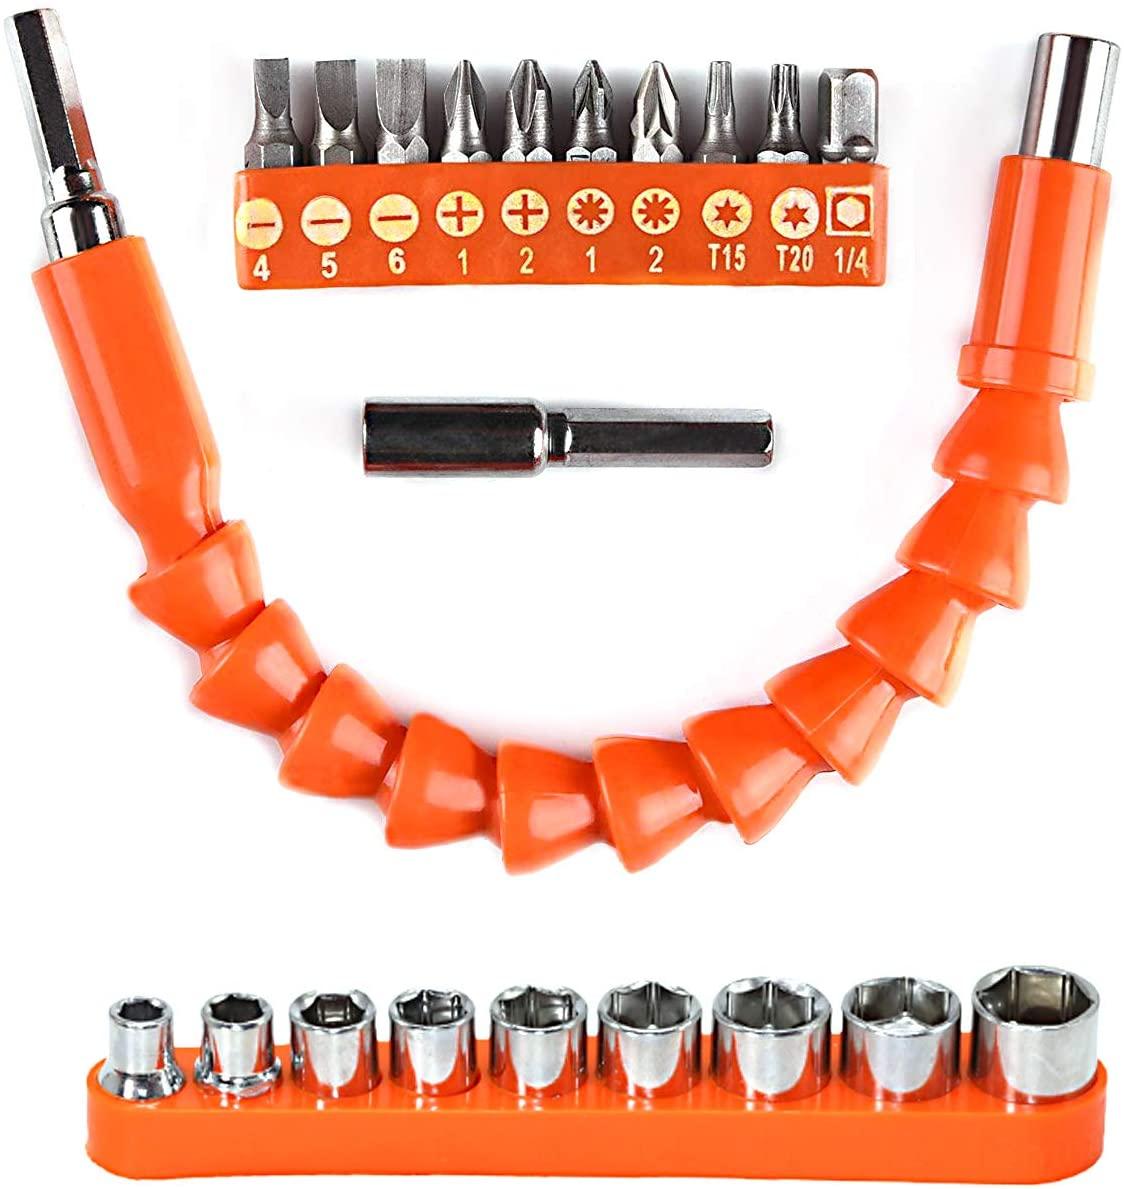 YIOYULEN Flexible Drill Bit Extension Kit, Flexible Soft Shaft Extension Screwdriver Bits Universal Nut Electric Drill Bit Power Hand Repair DIY Tools Accessories with Drill Bit Set (21 PCS)